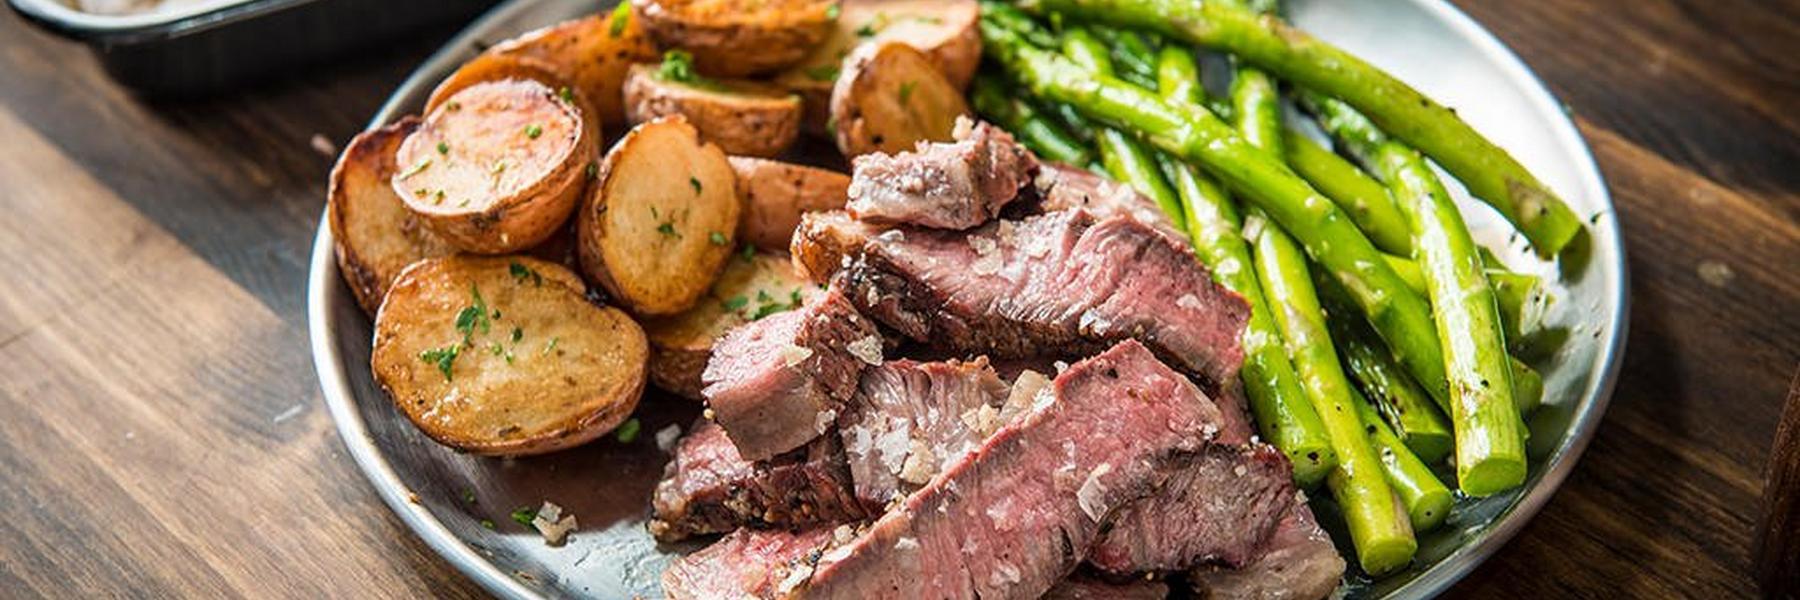 Reverse-Sear-Rib-Eye-Steaks_Traeger-Wood-Pellet-Grills_RE_HE_M